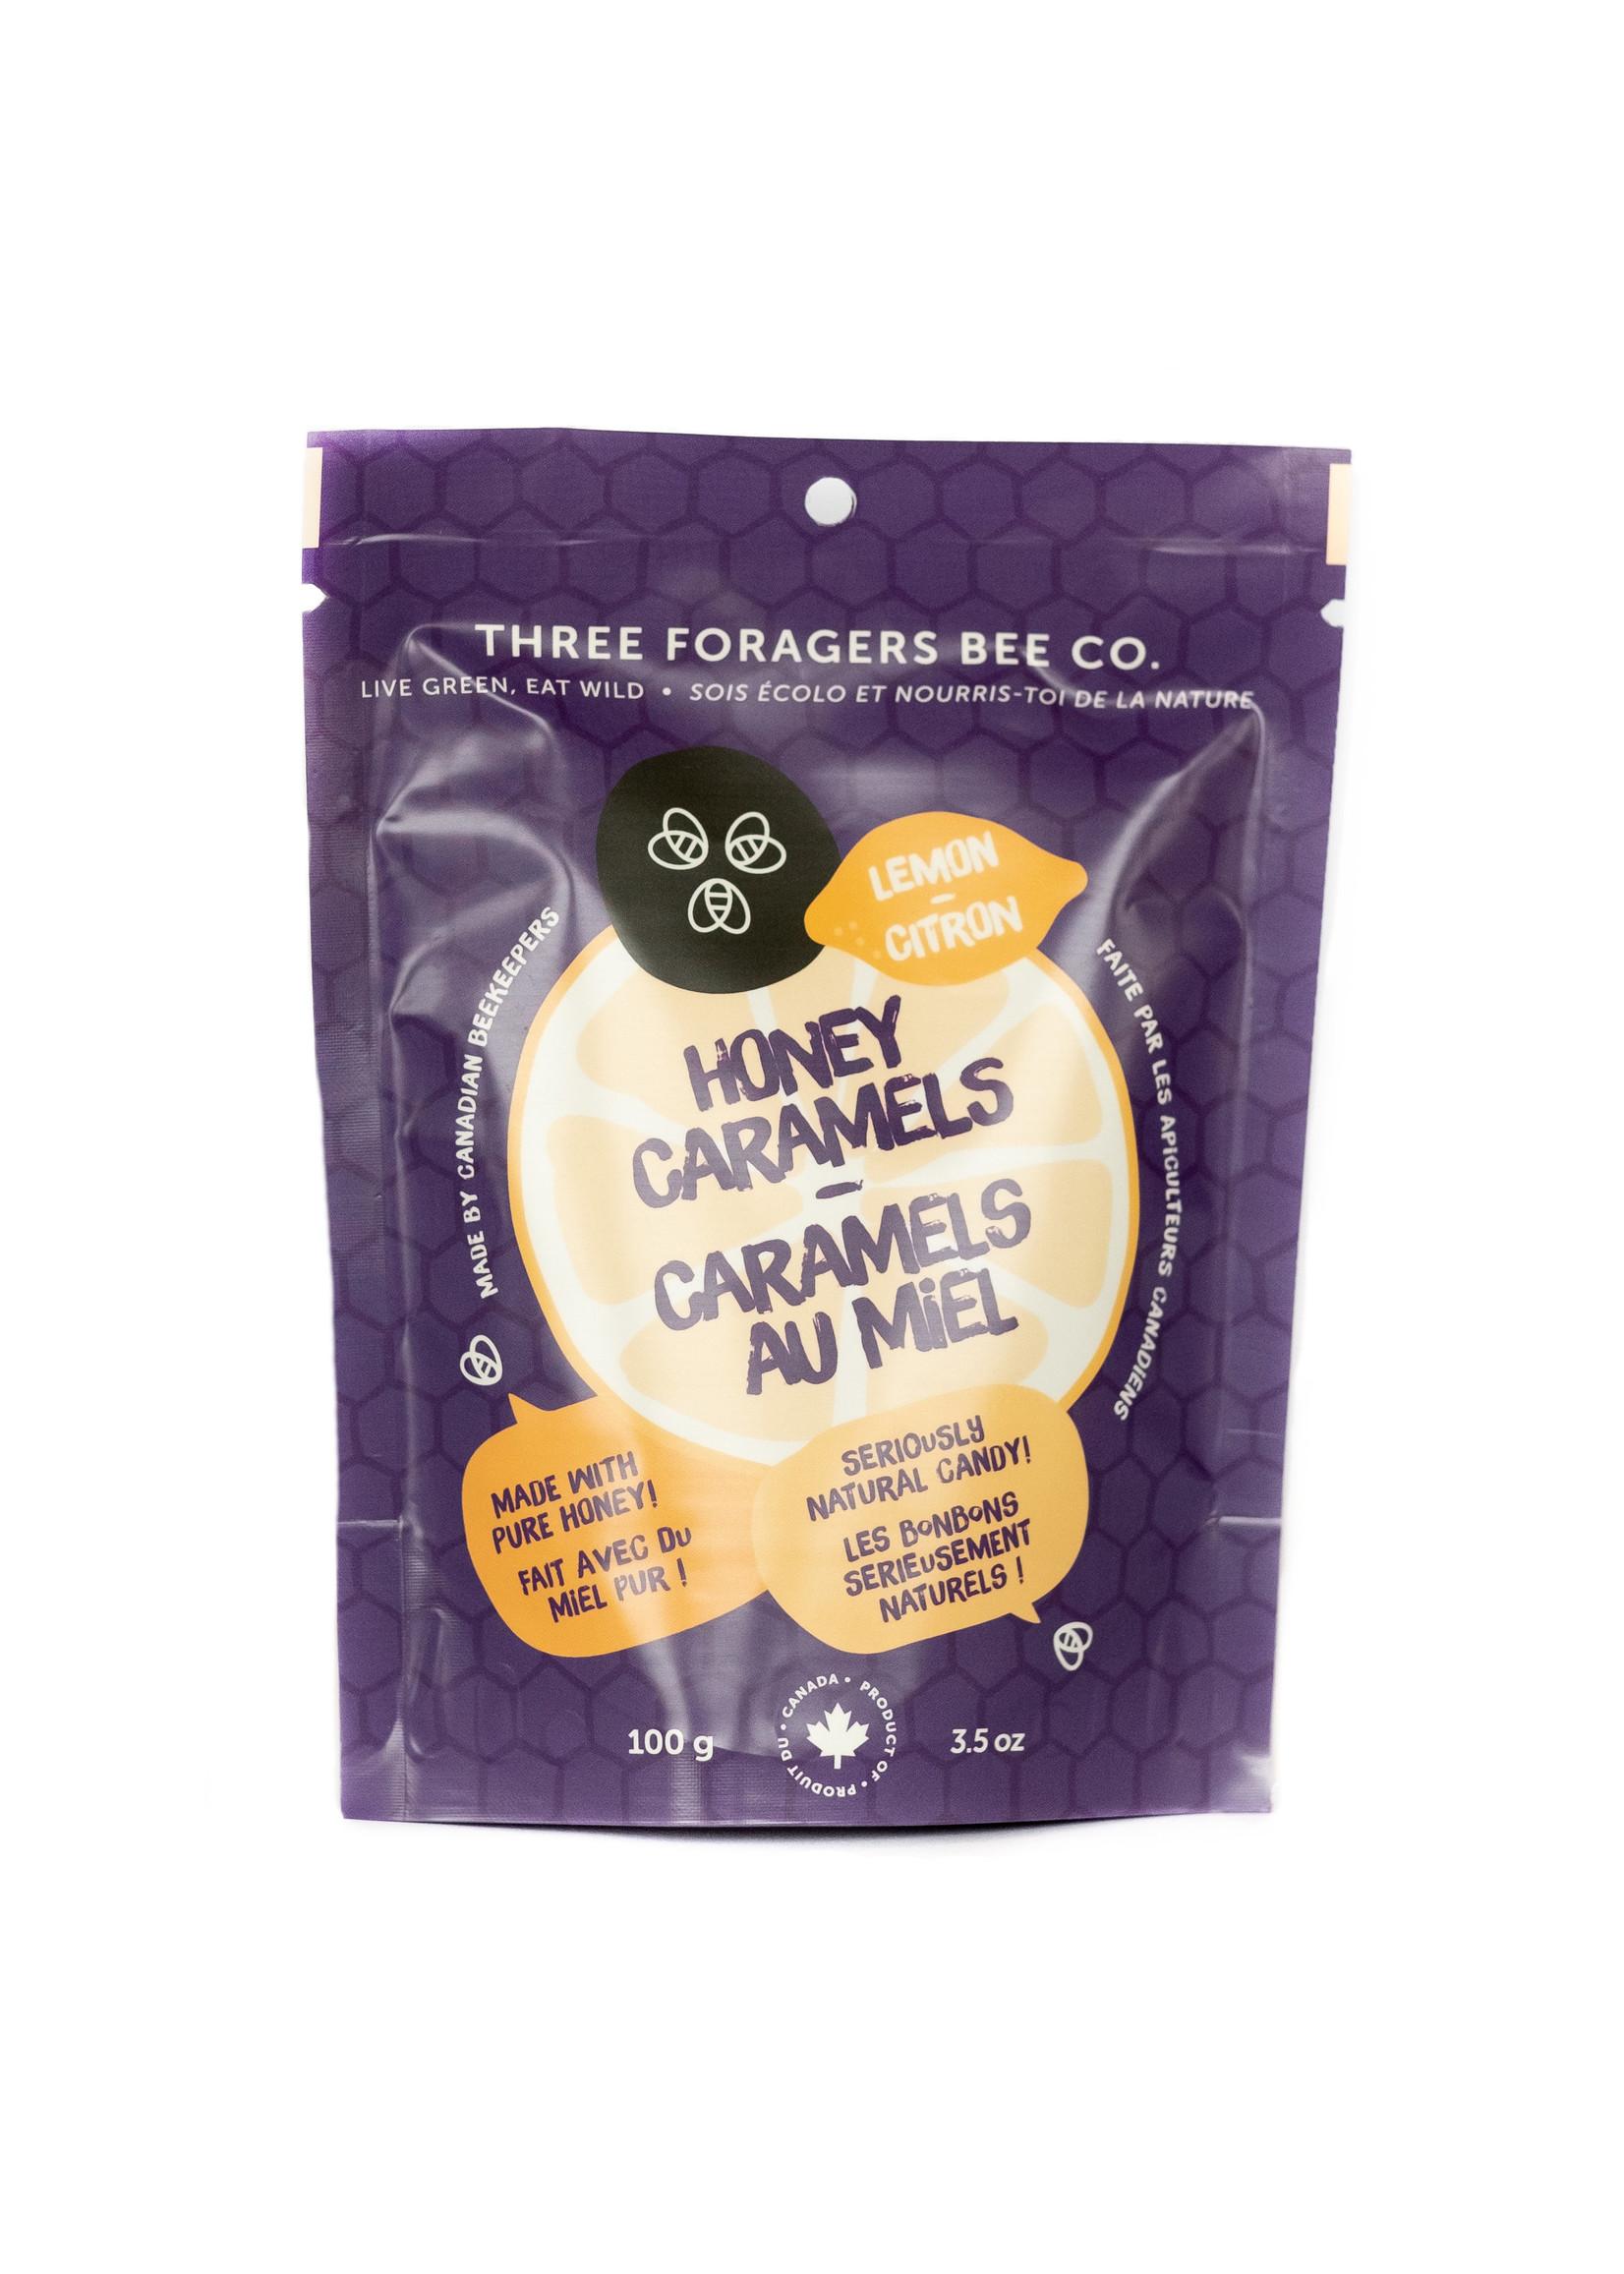 Three Foragers Honey Caramels Lemon 100g